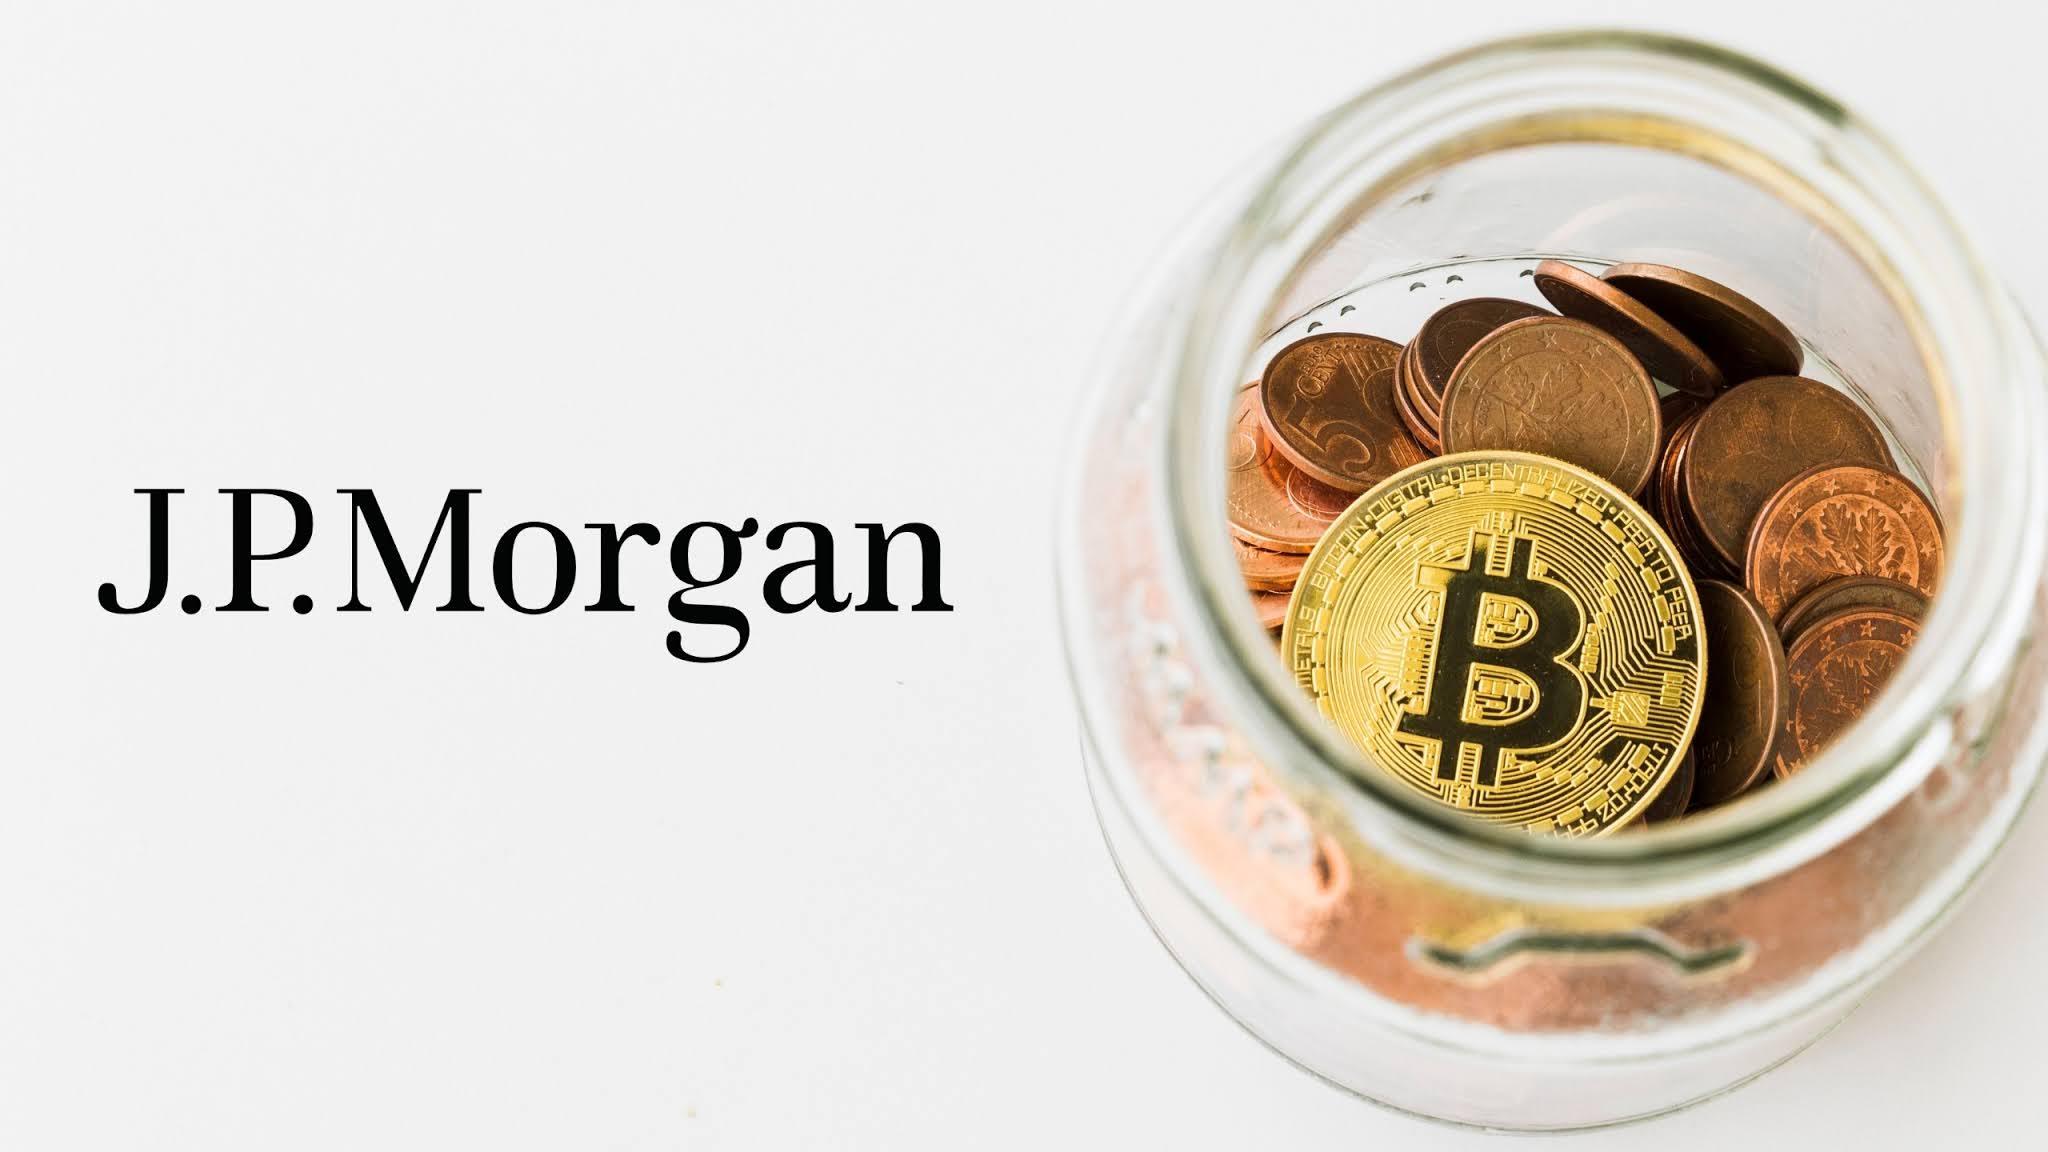 J.P. Morgan Analistlerinden Muazzam Seviyede Bitcoin Tahmini!